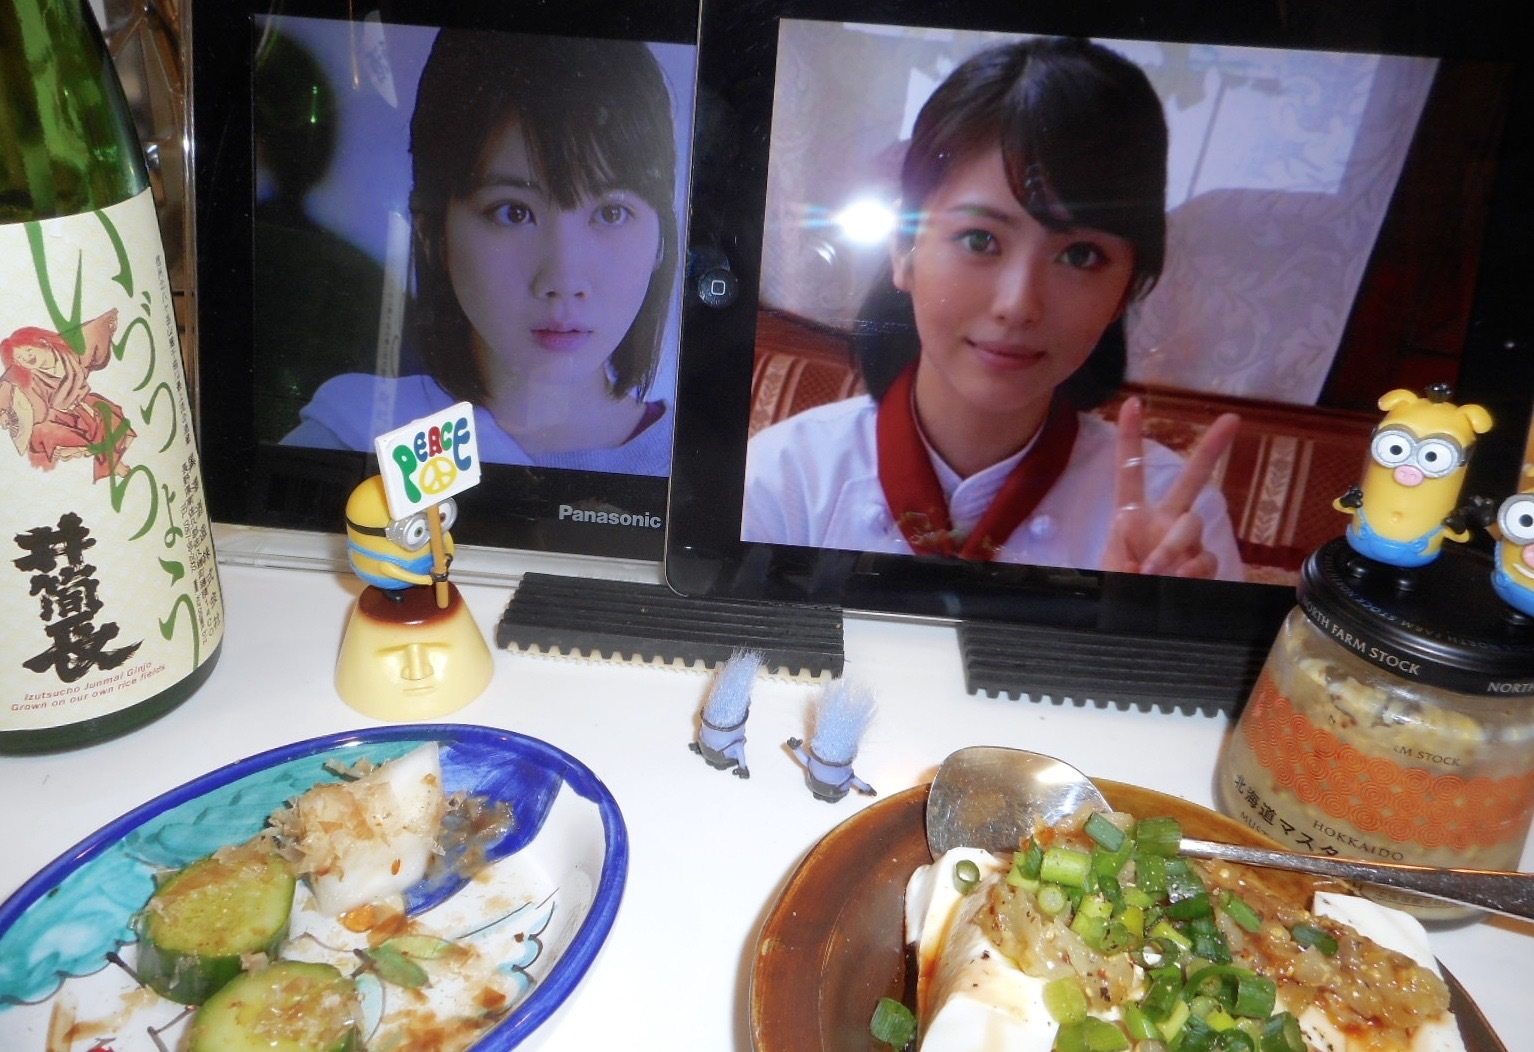 izutsuchou_jikagumi29by2_5.jpg